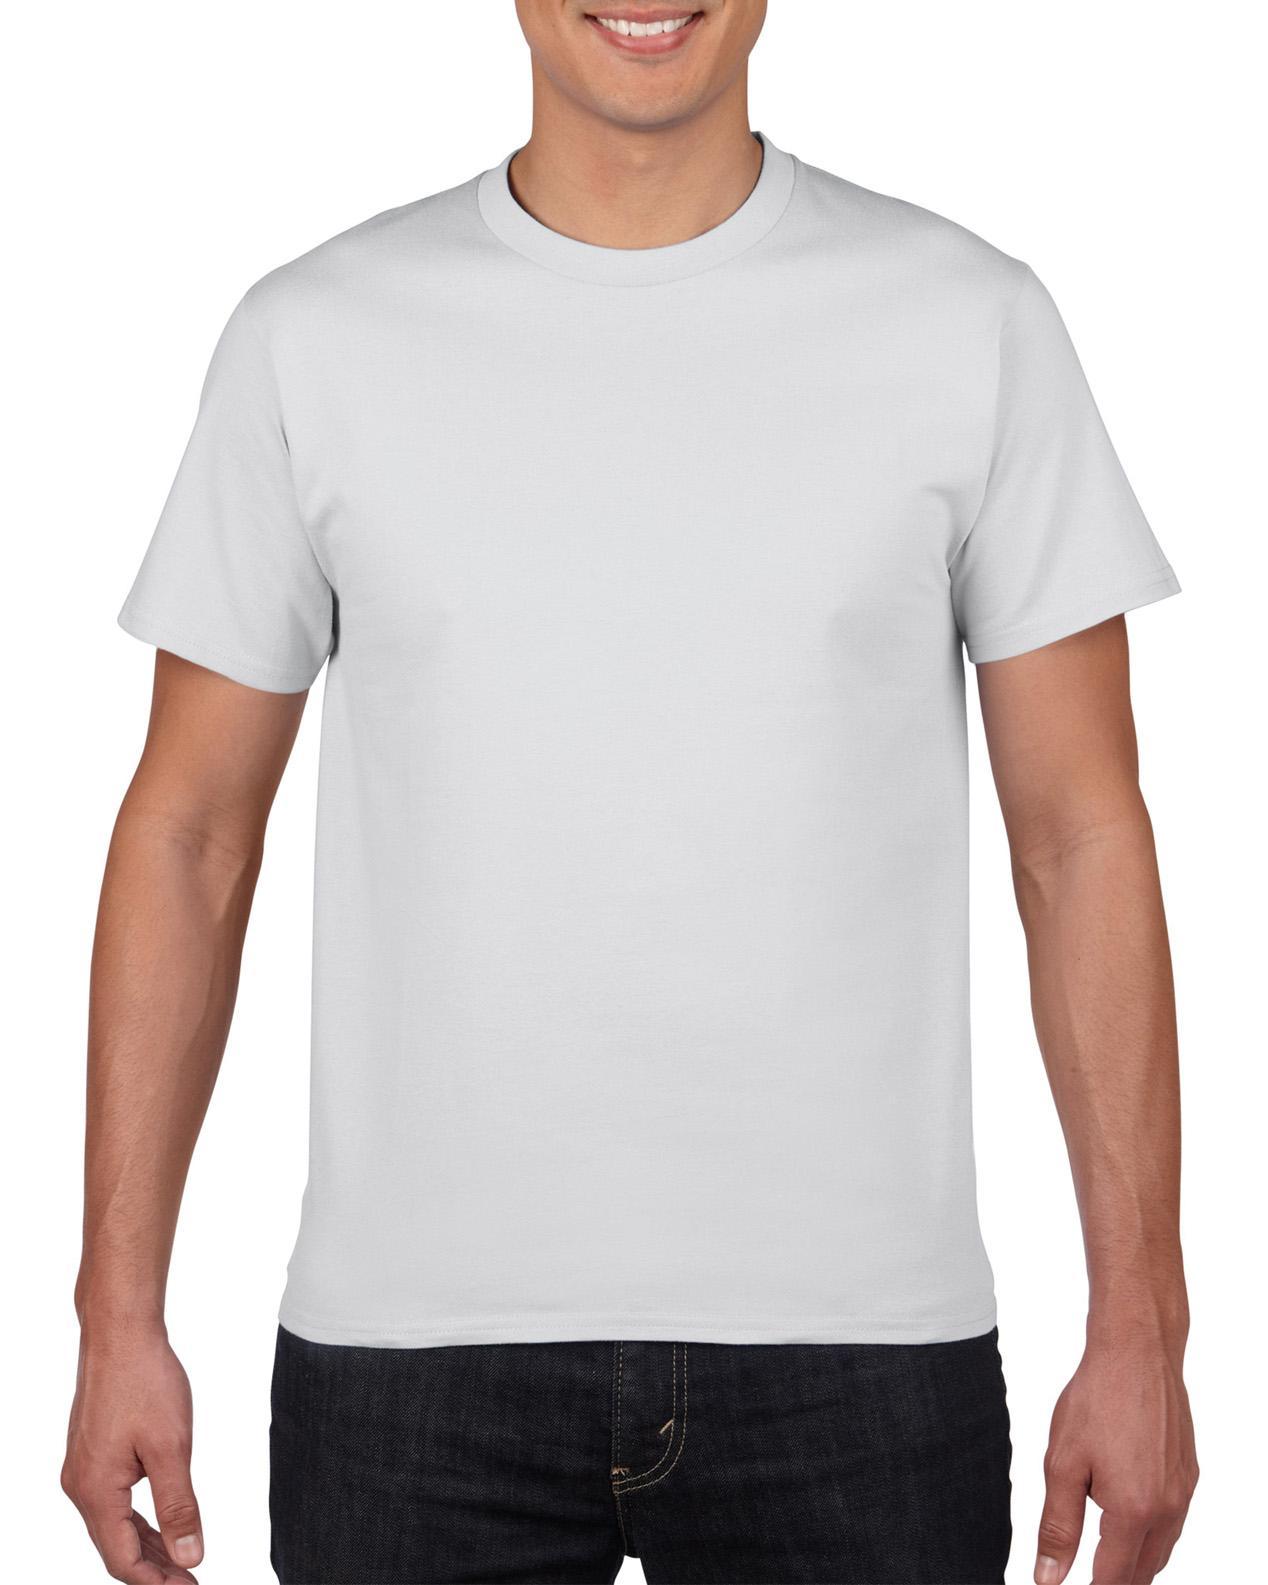 109a410172ad Gildan Philippines: Gildan price list - Gildan Shirt, Hoodie ...